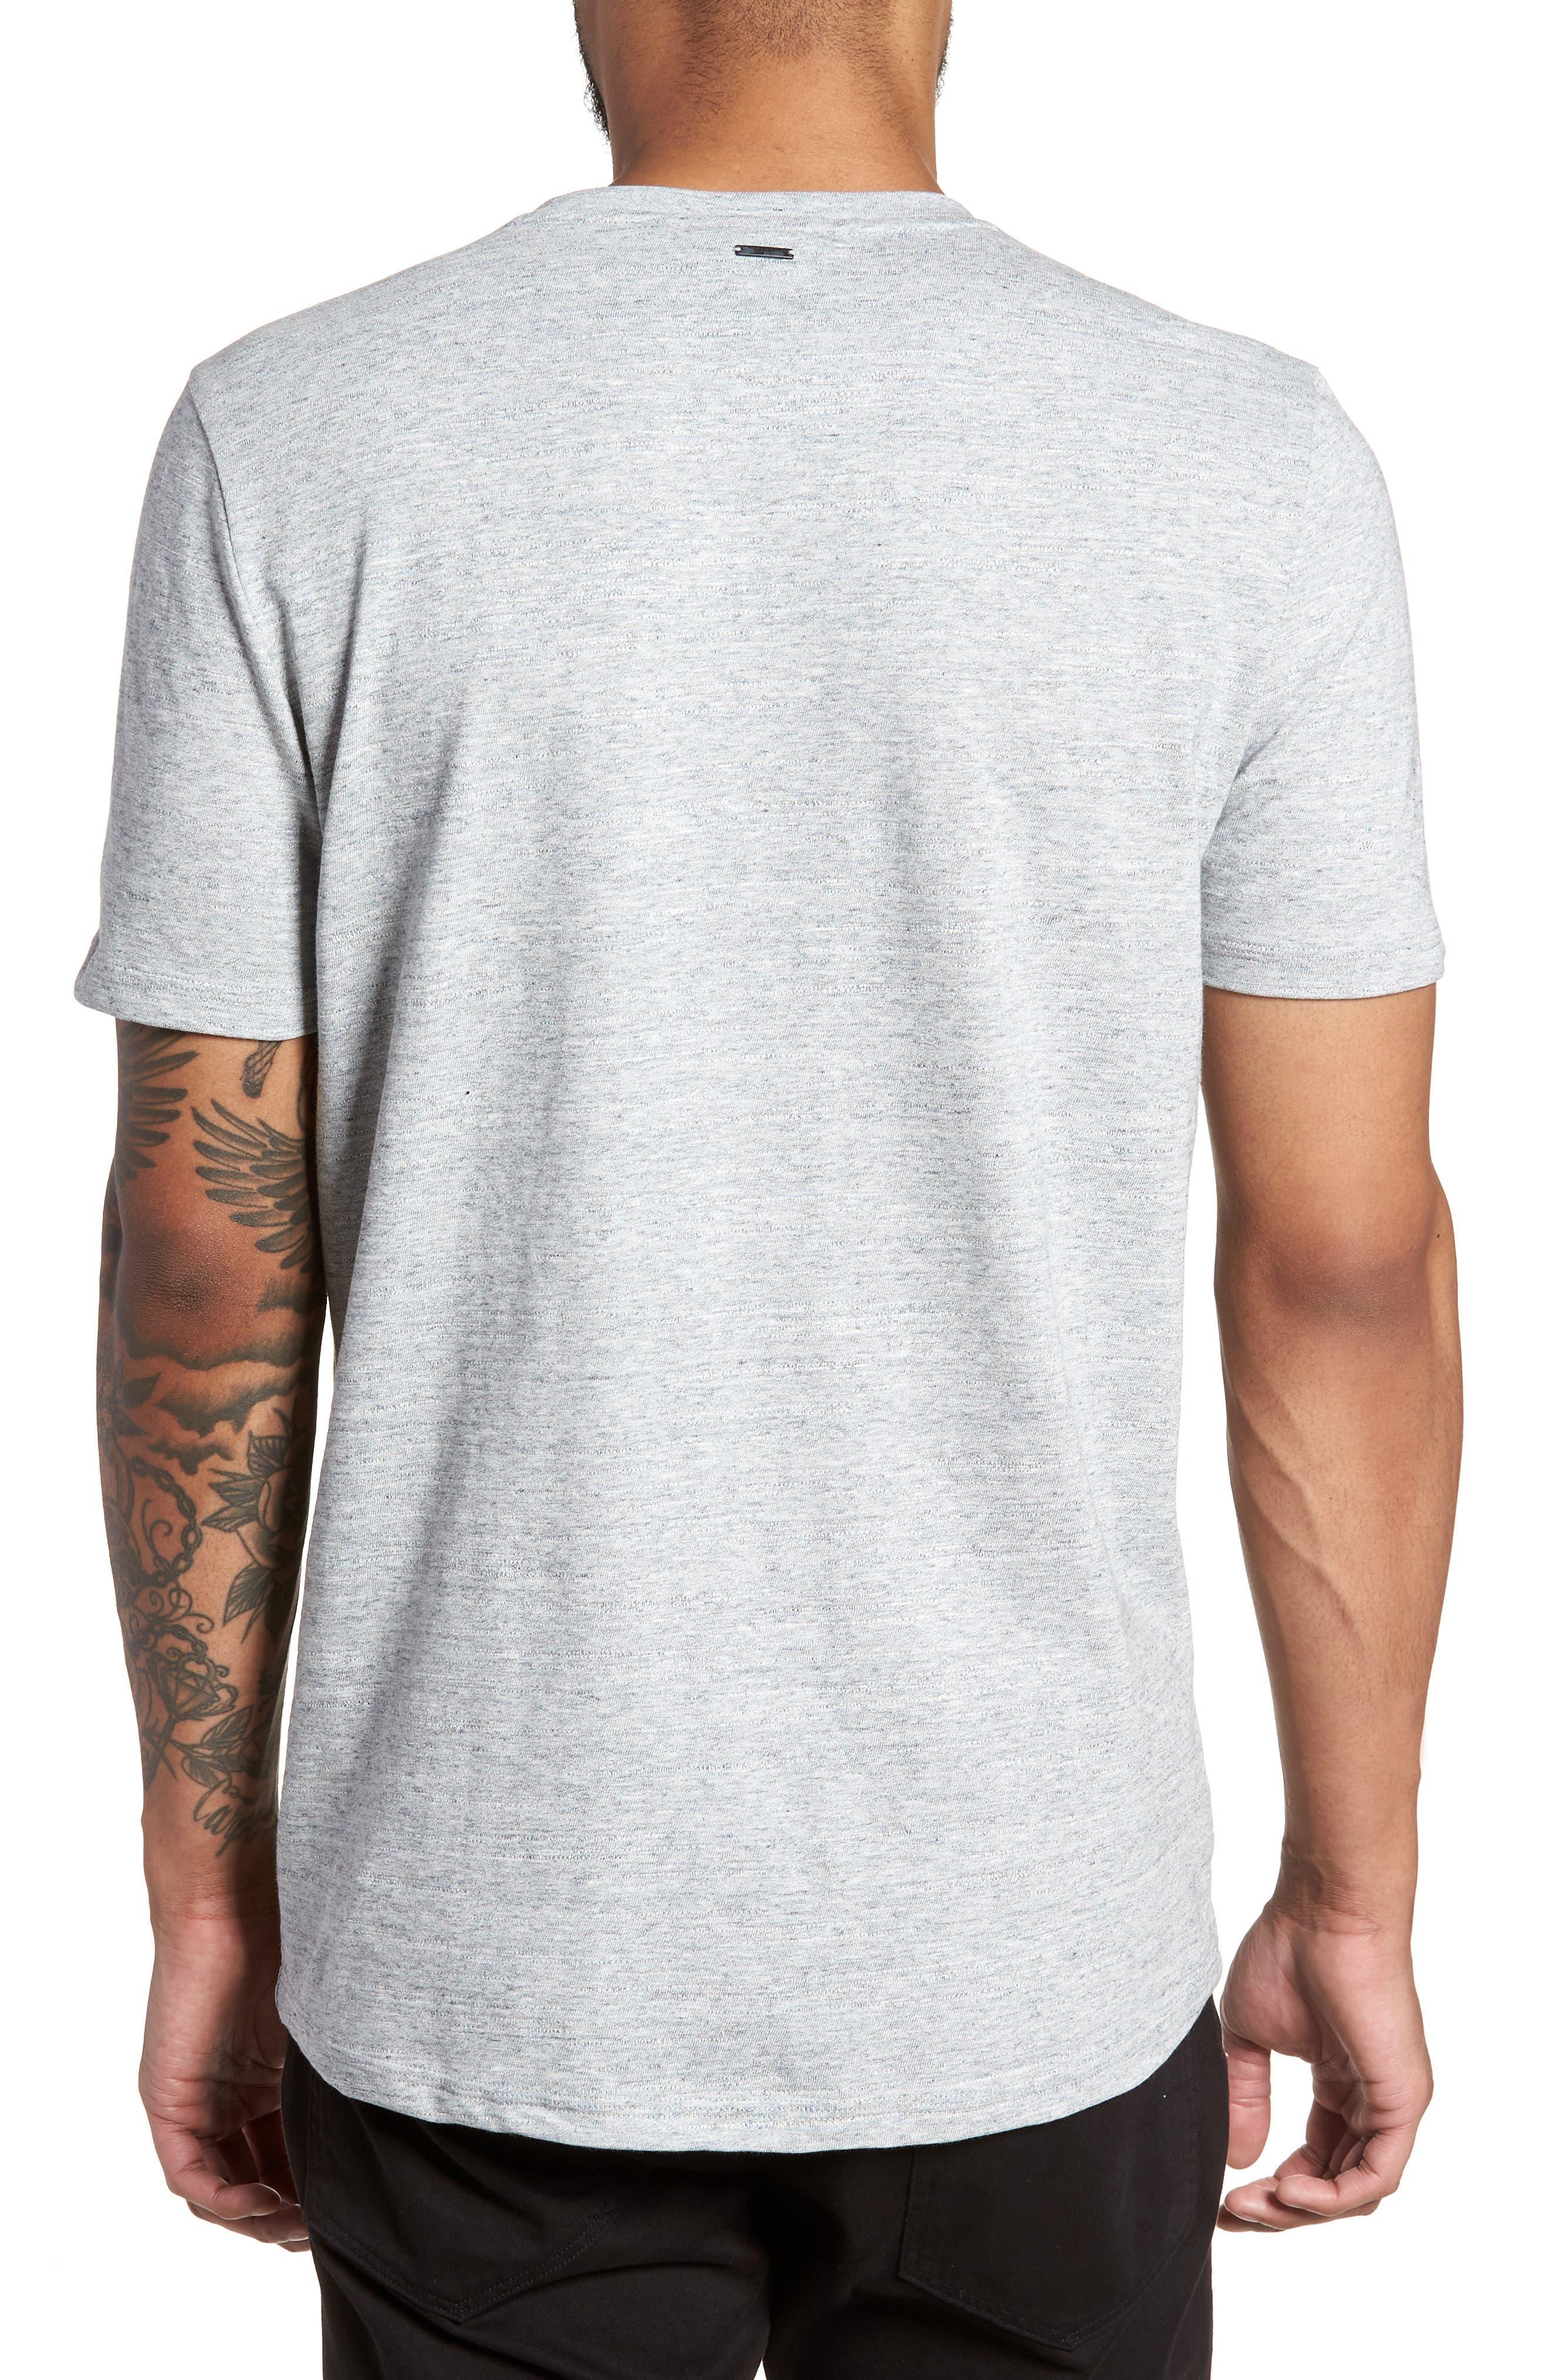 Dohnny Crewneck T-Shirt,                             Alternate thumbnail 2, color,                             Grey